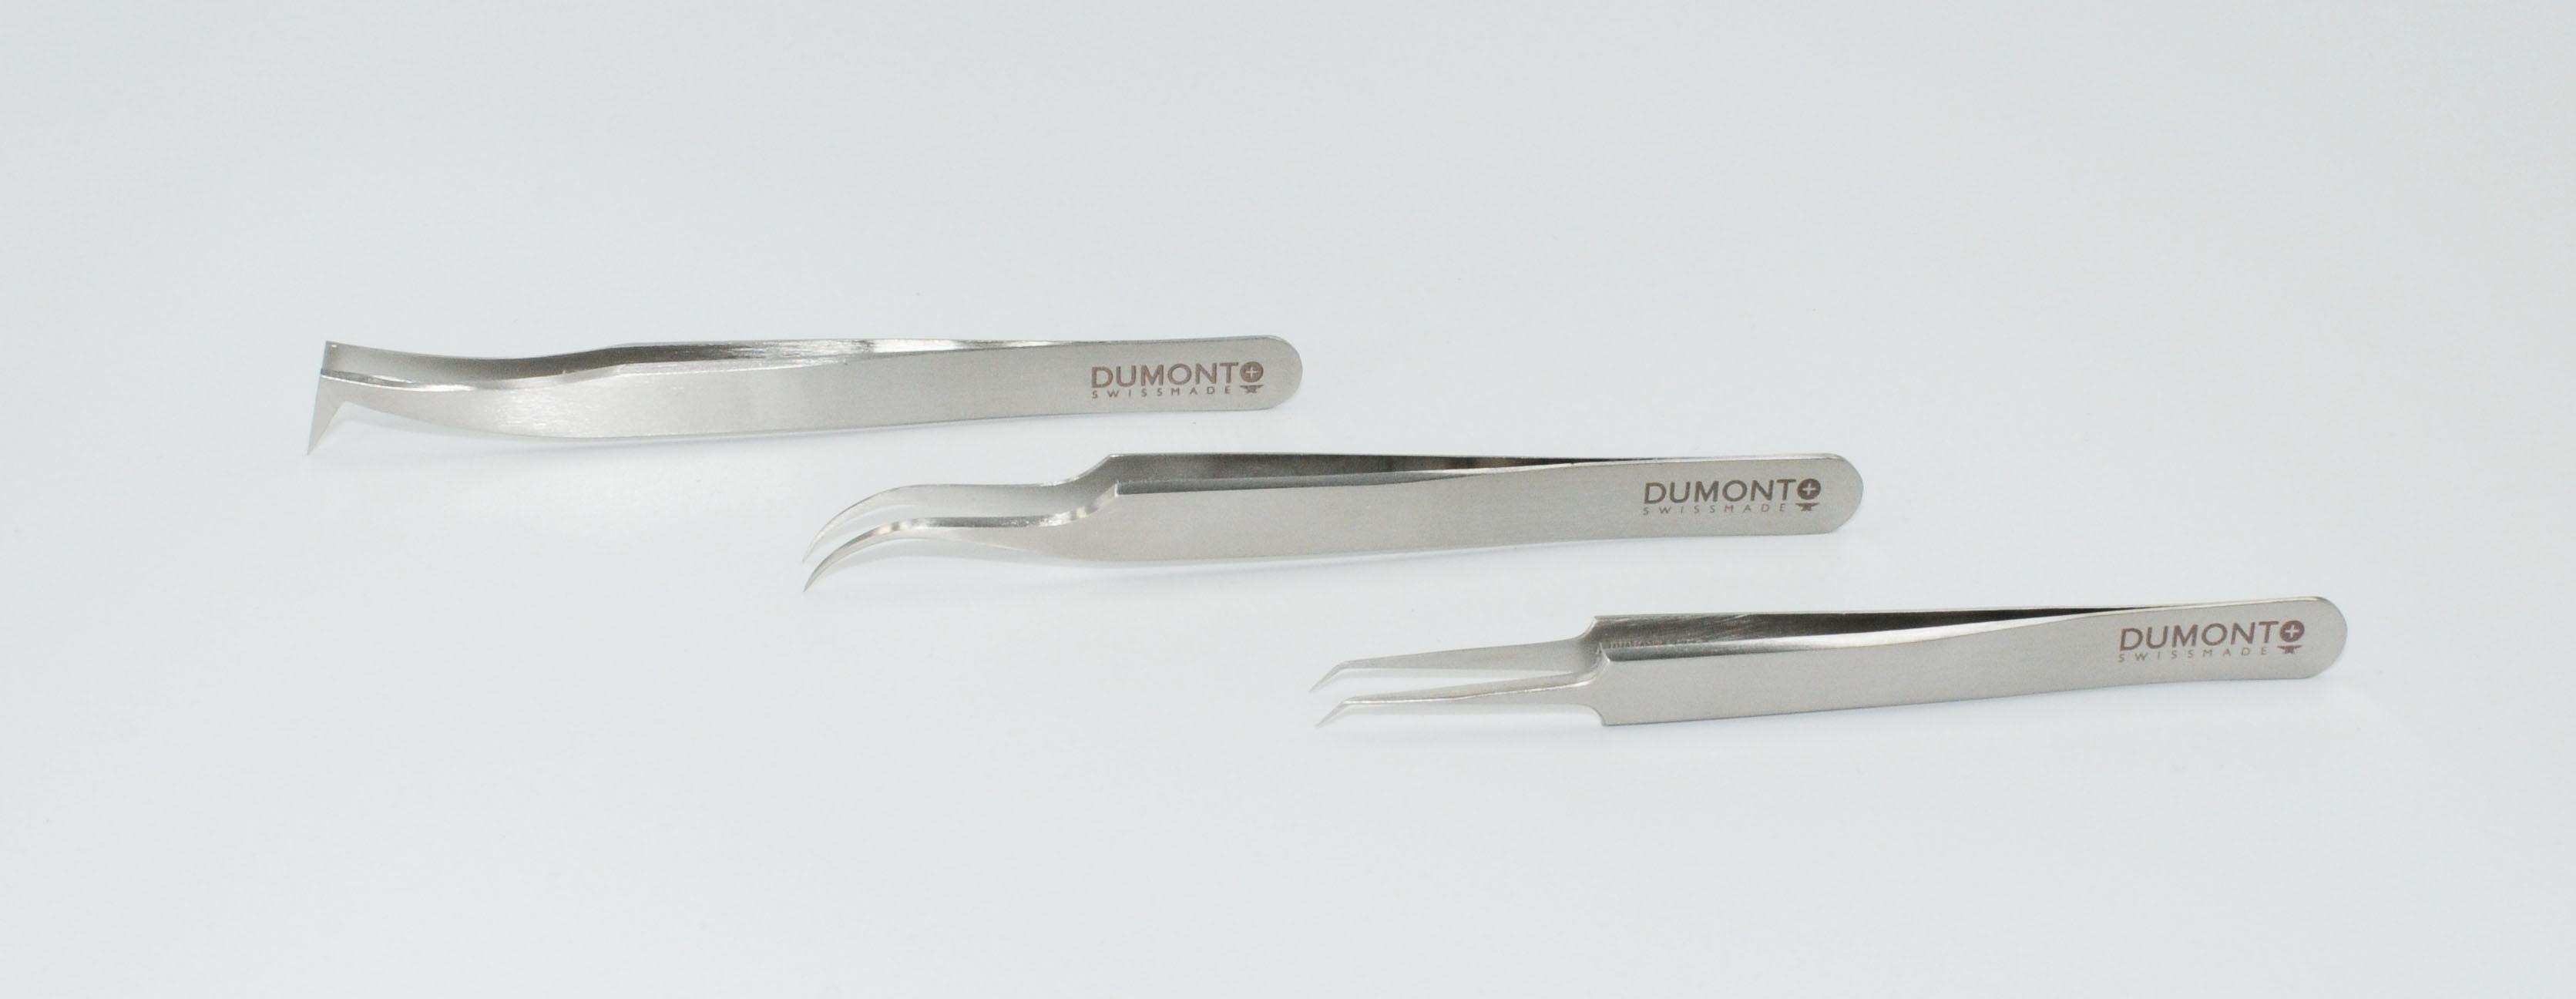 dumontall